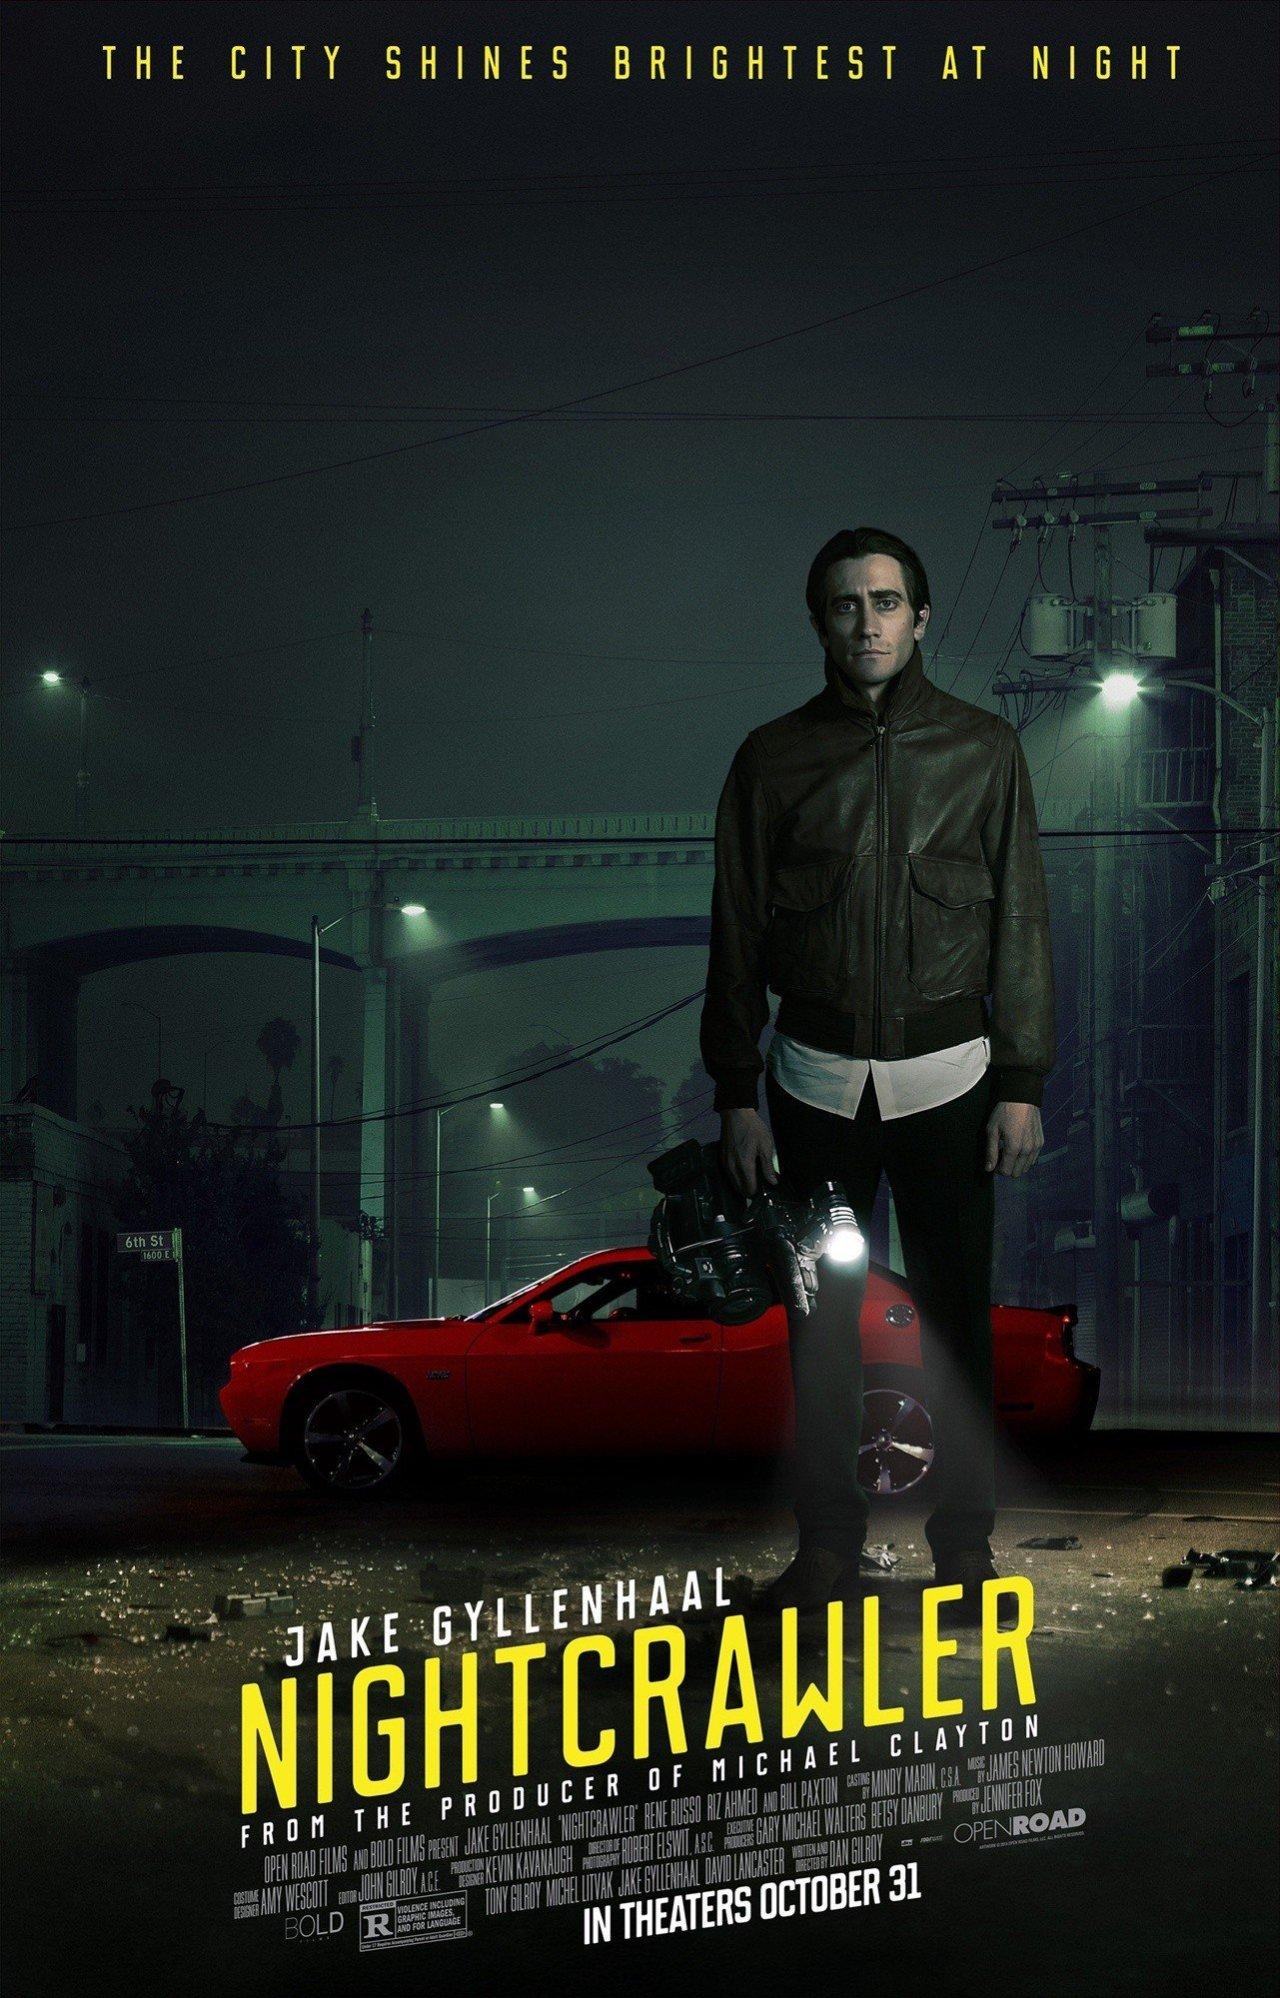 nightcrawler-poster04